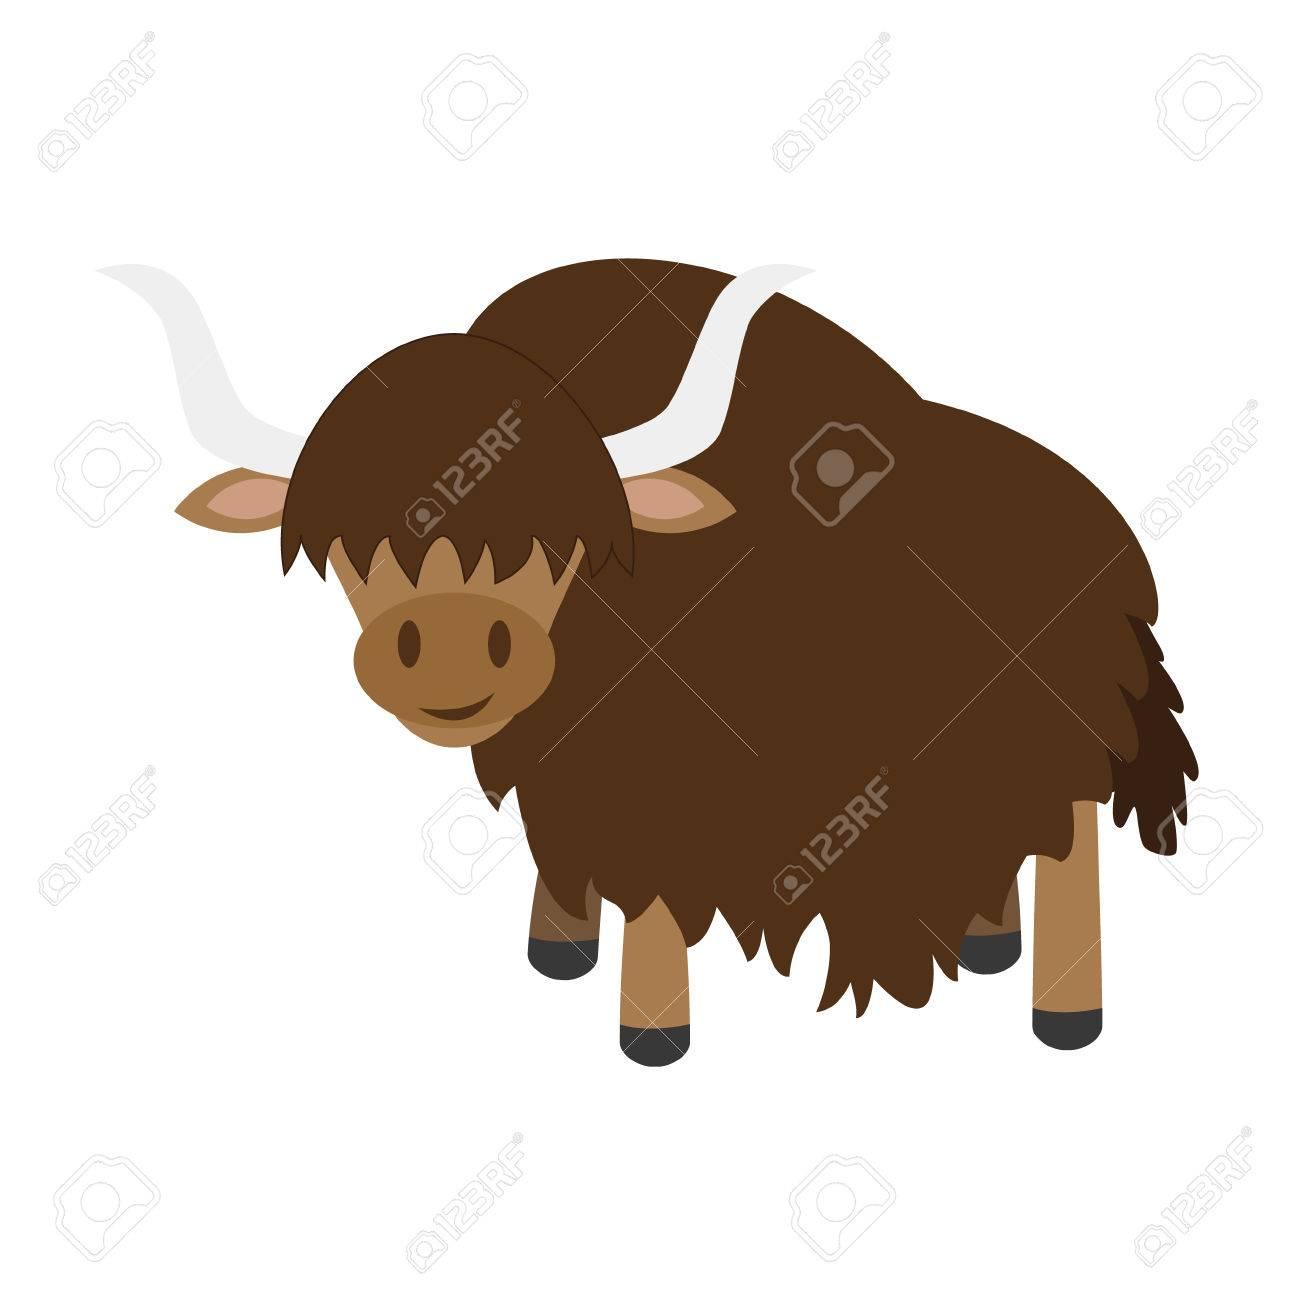 Cute cartoon yak vector illustration.